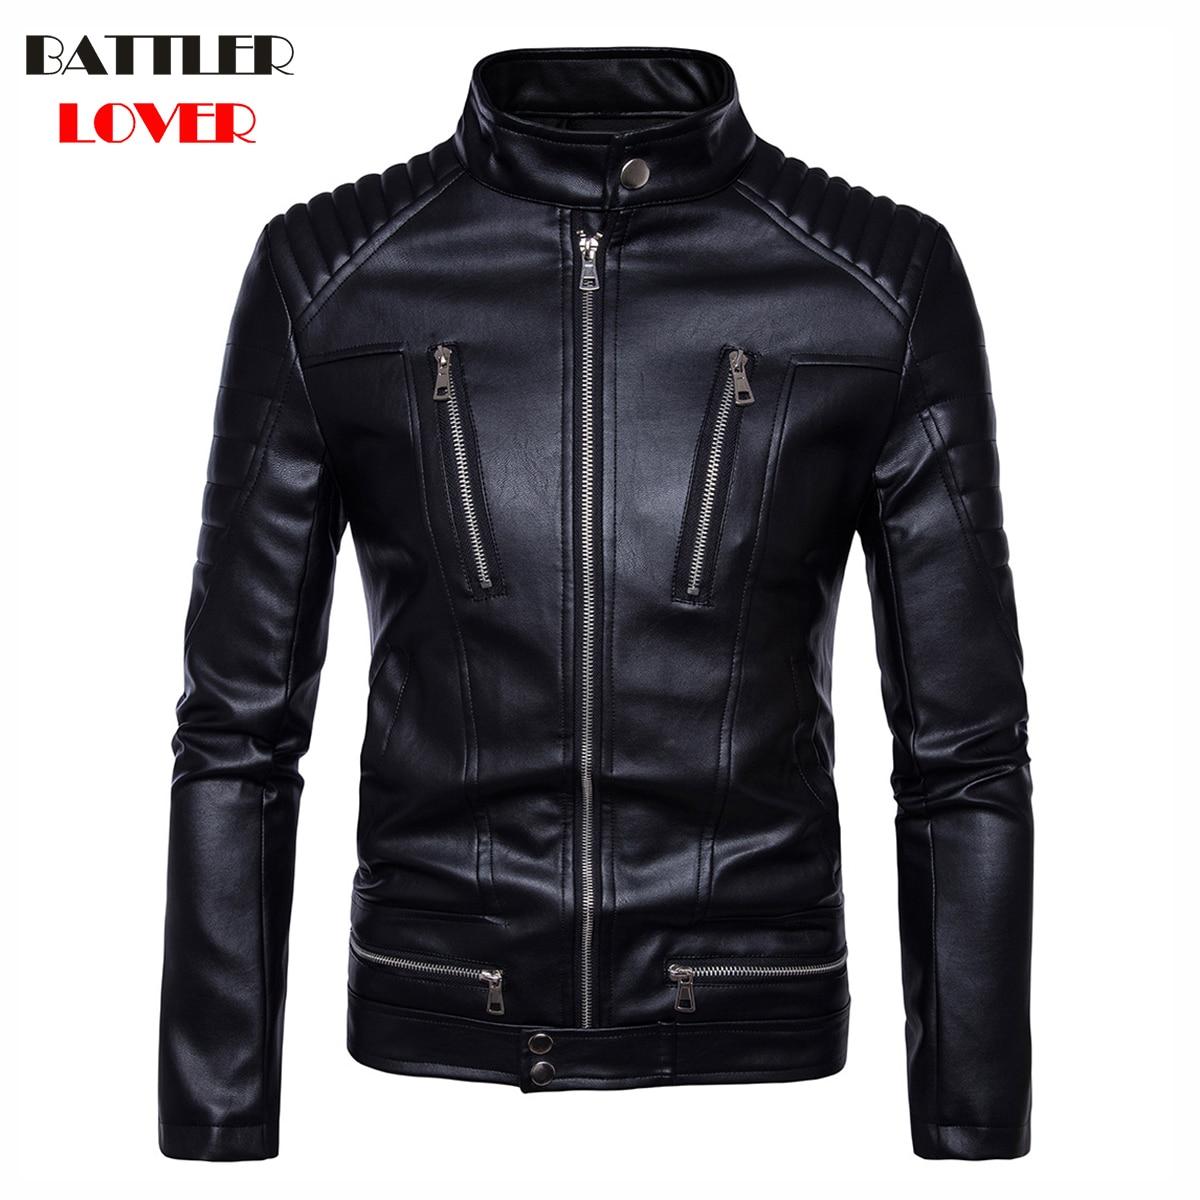 2018 Genuine Leather Jackets Men Bomber Winter Motorcycle Jacket Mens Natural Leather Windbreaker Moto Biker Coat Hombre Clothes